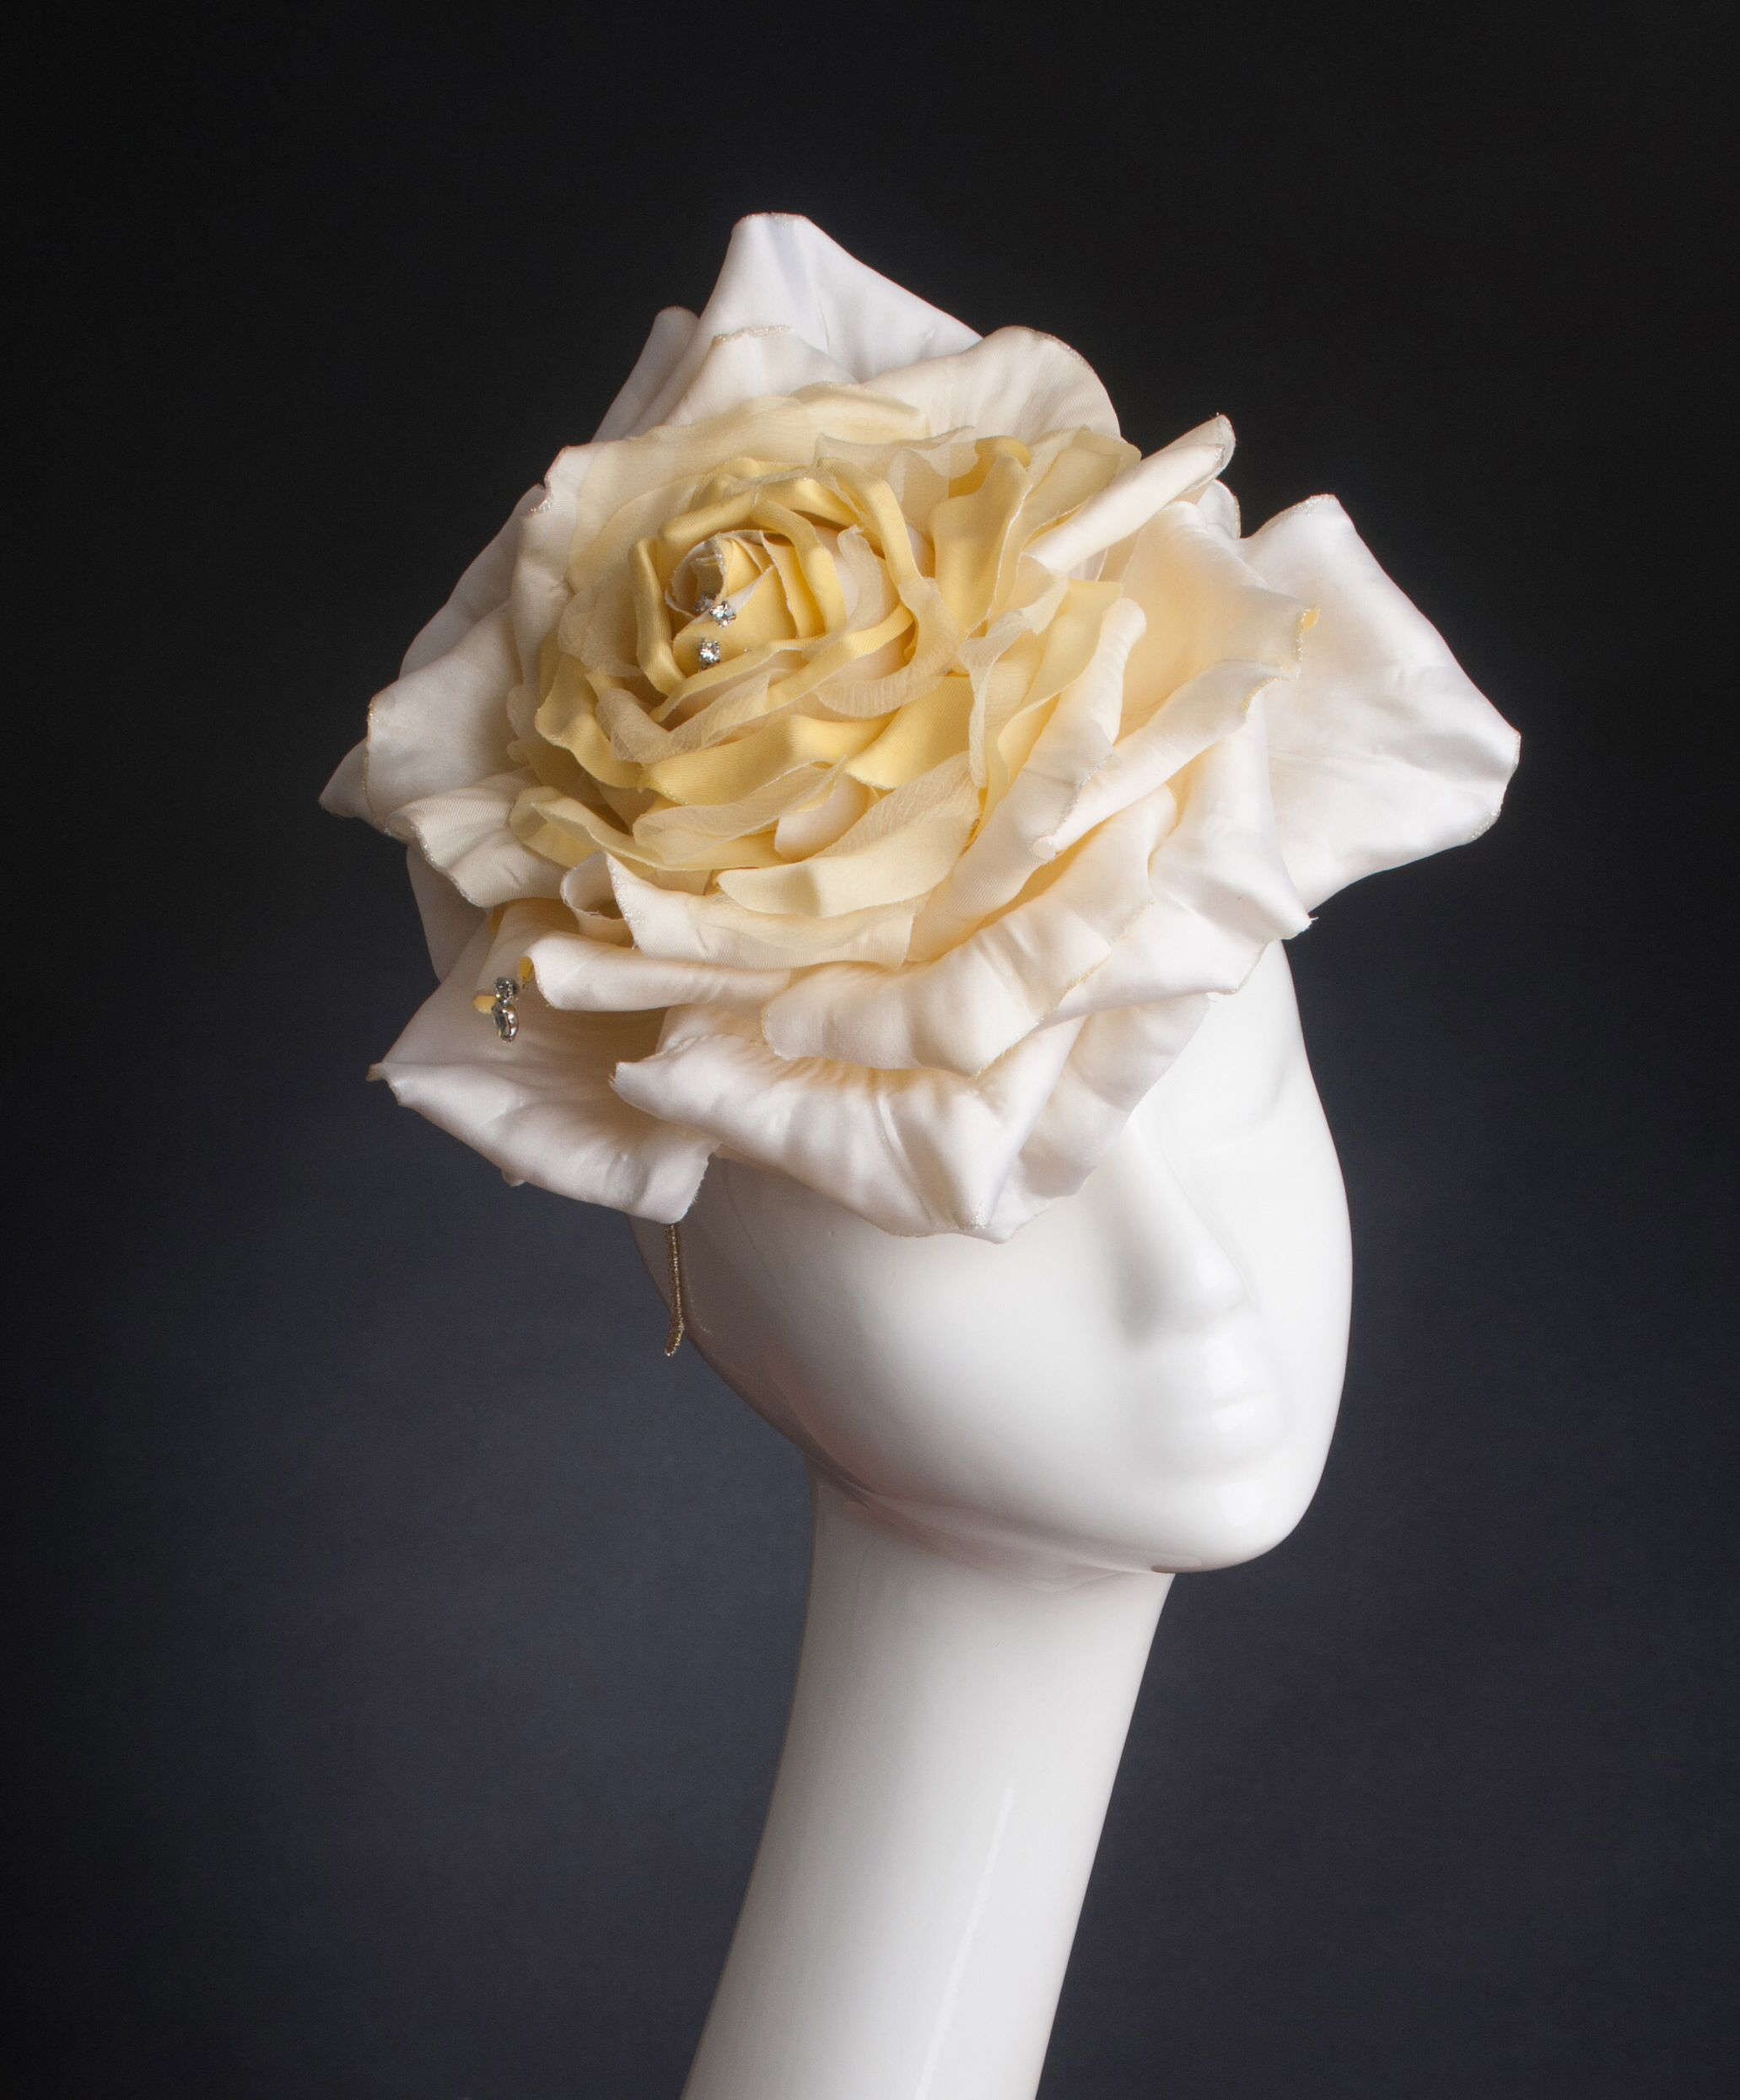 Classic silk rose by Lomax & skinner